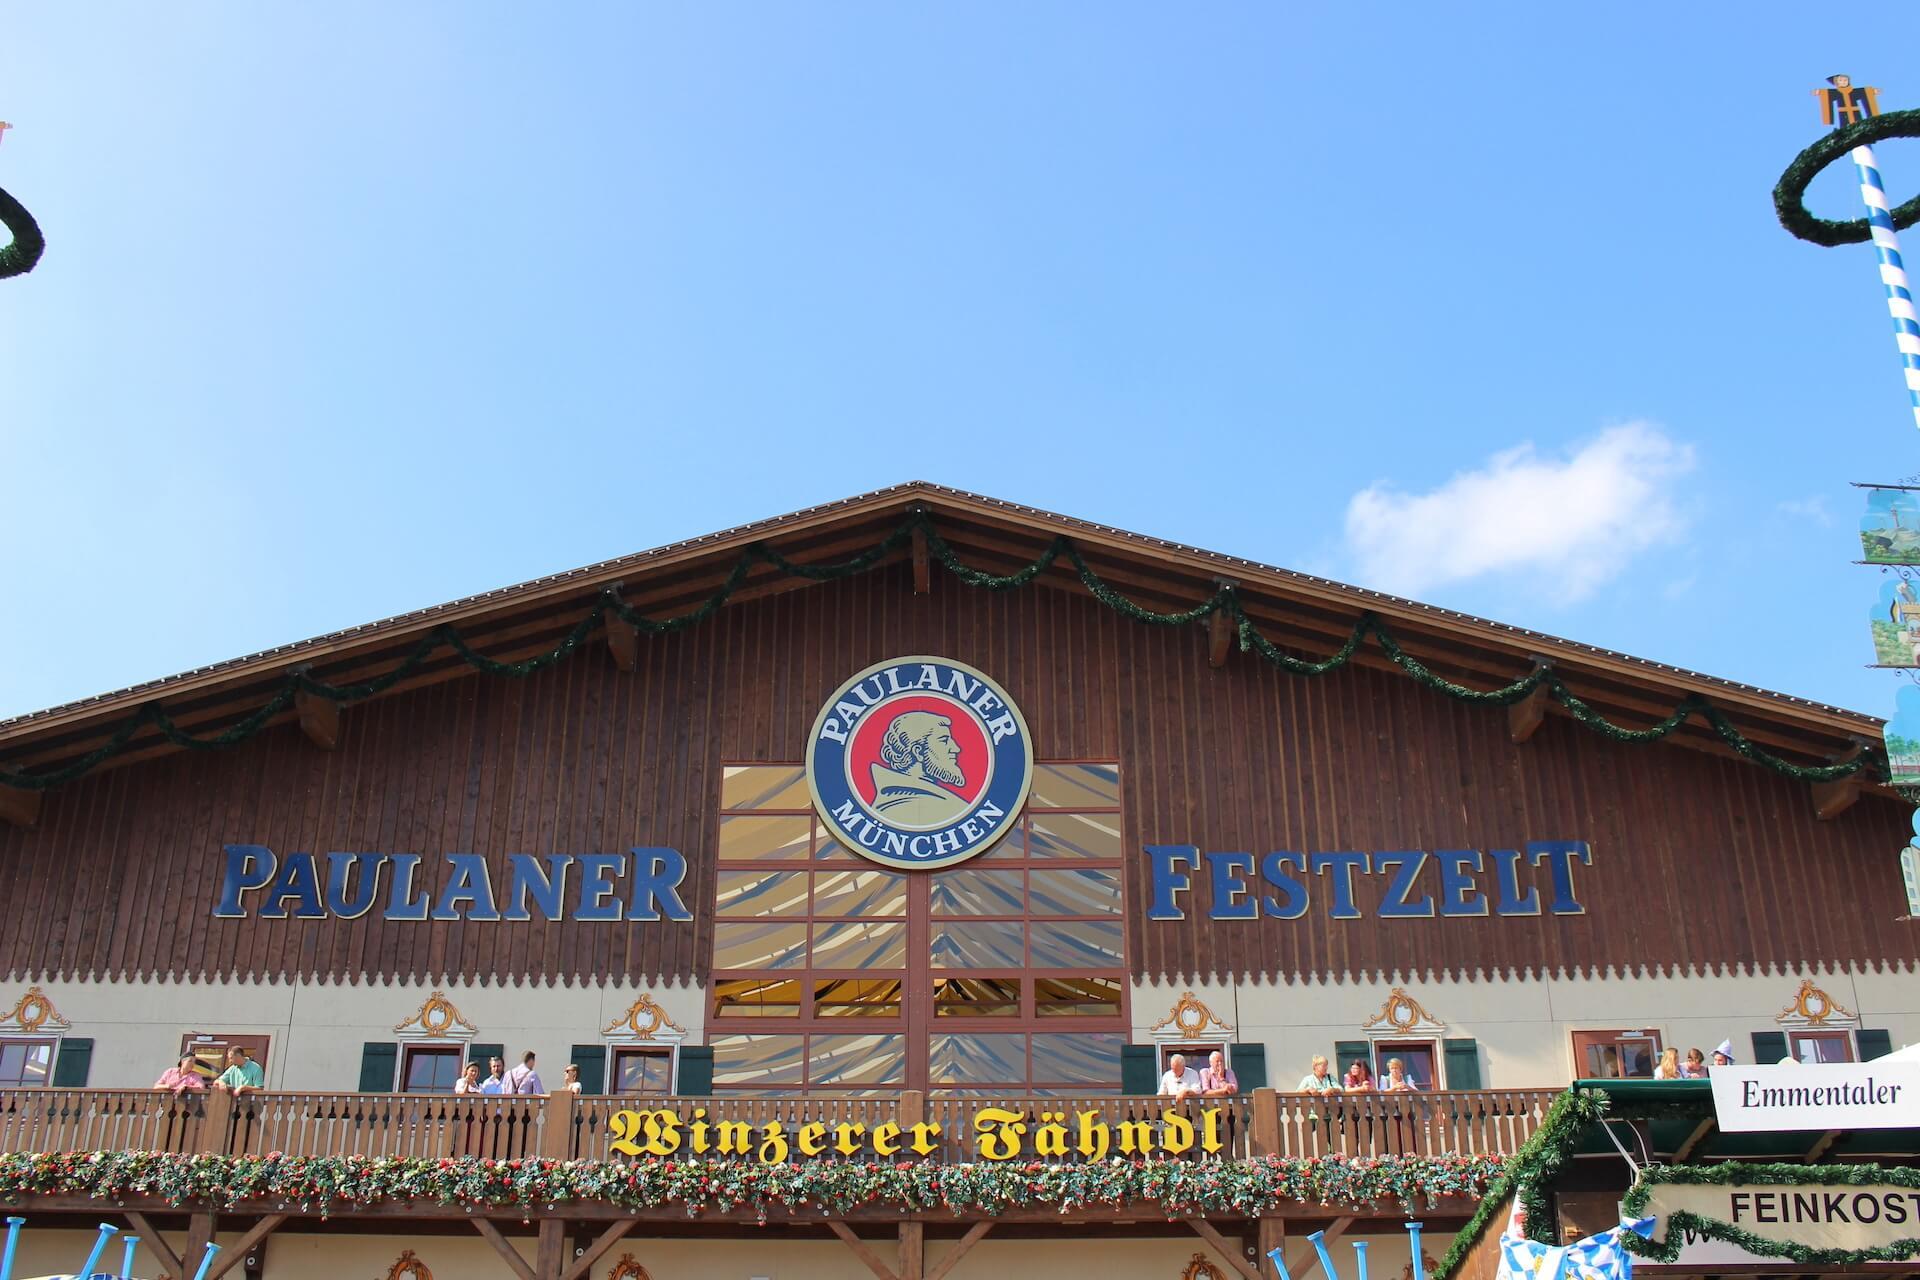 Oktoberfest Beer Tent - Paulaner